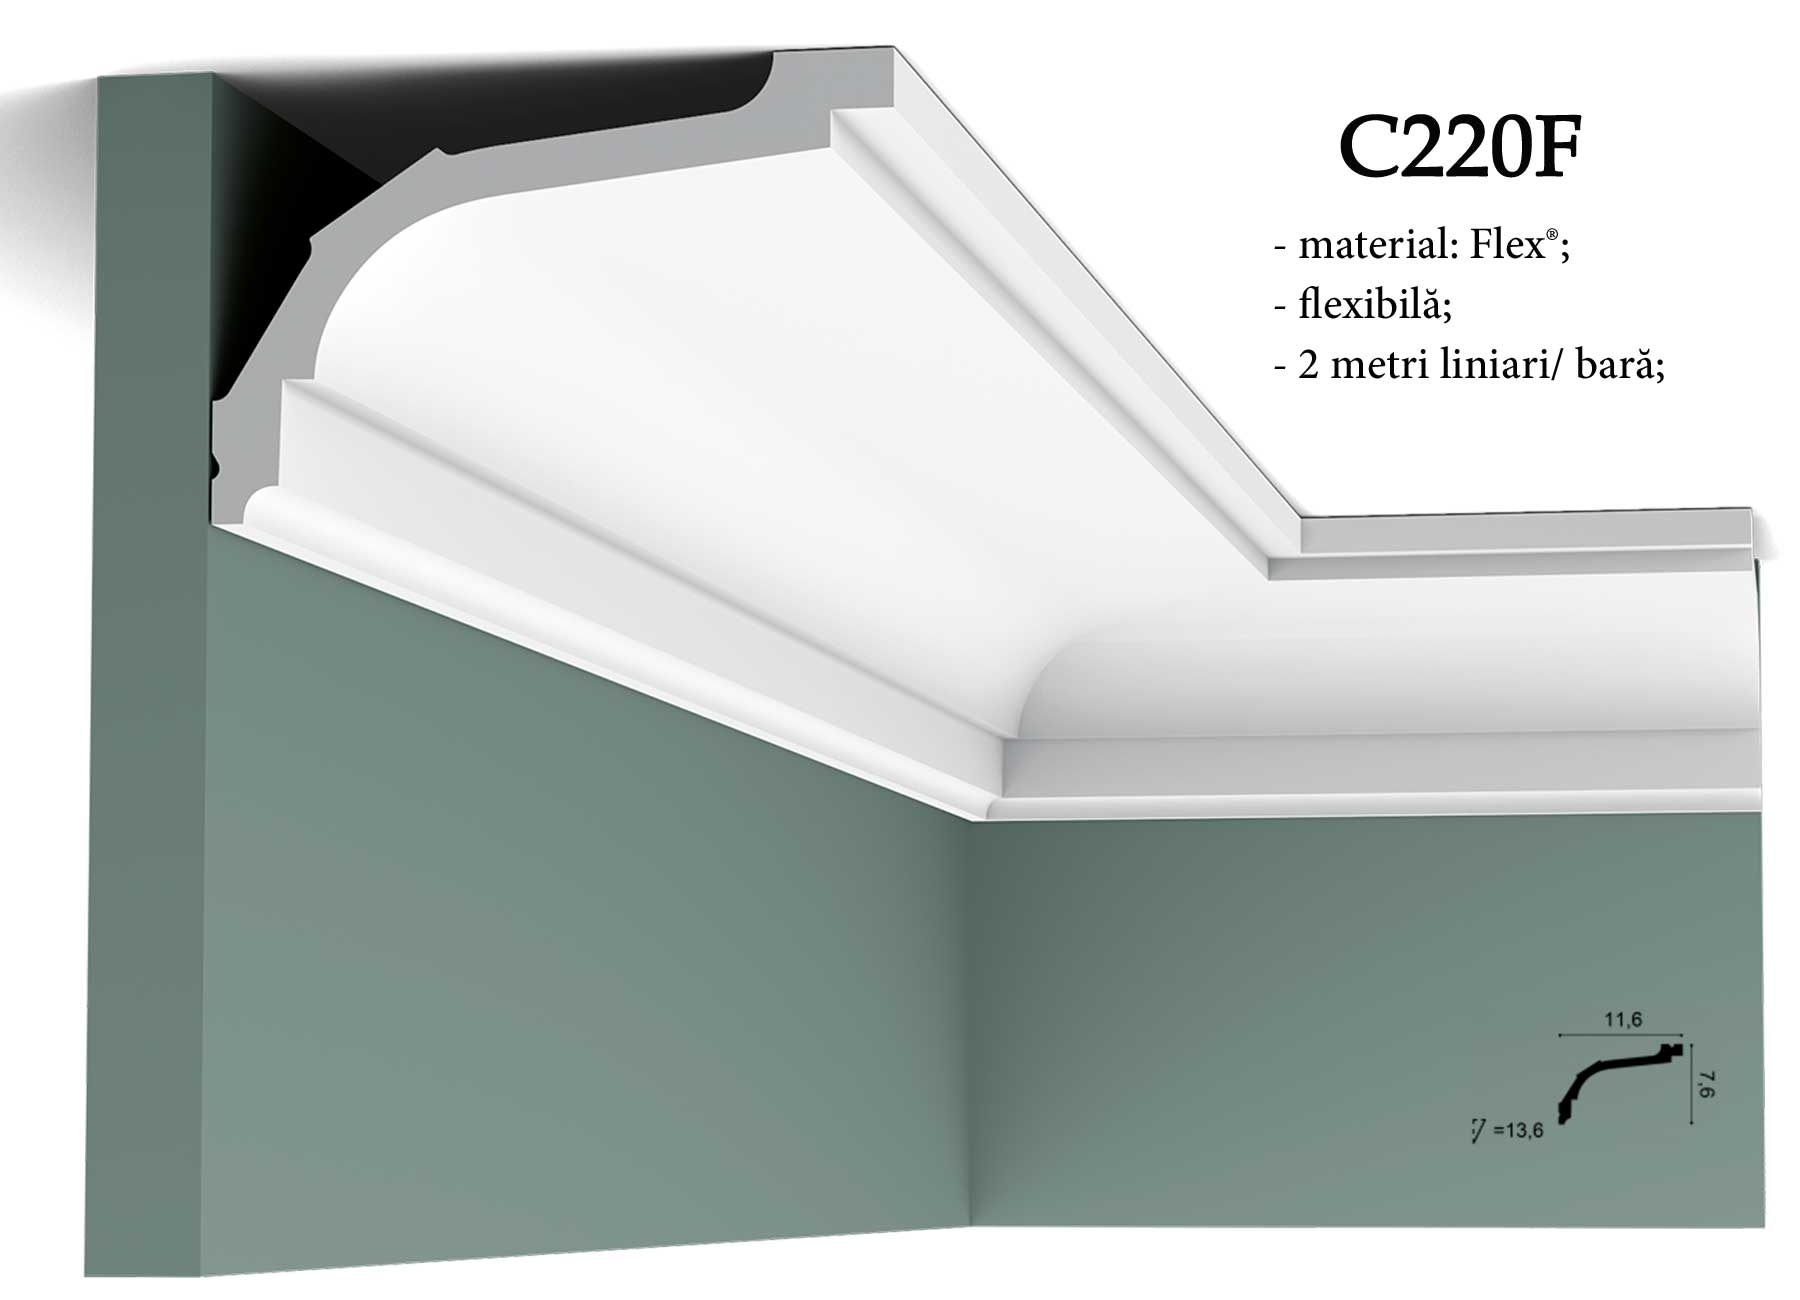 Cornisa flexibila C220F pentru tavan Orac Decor.